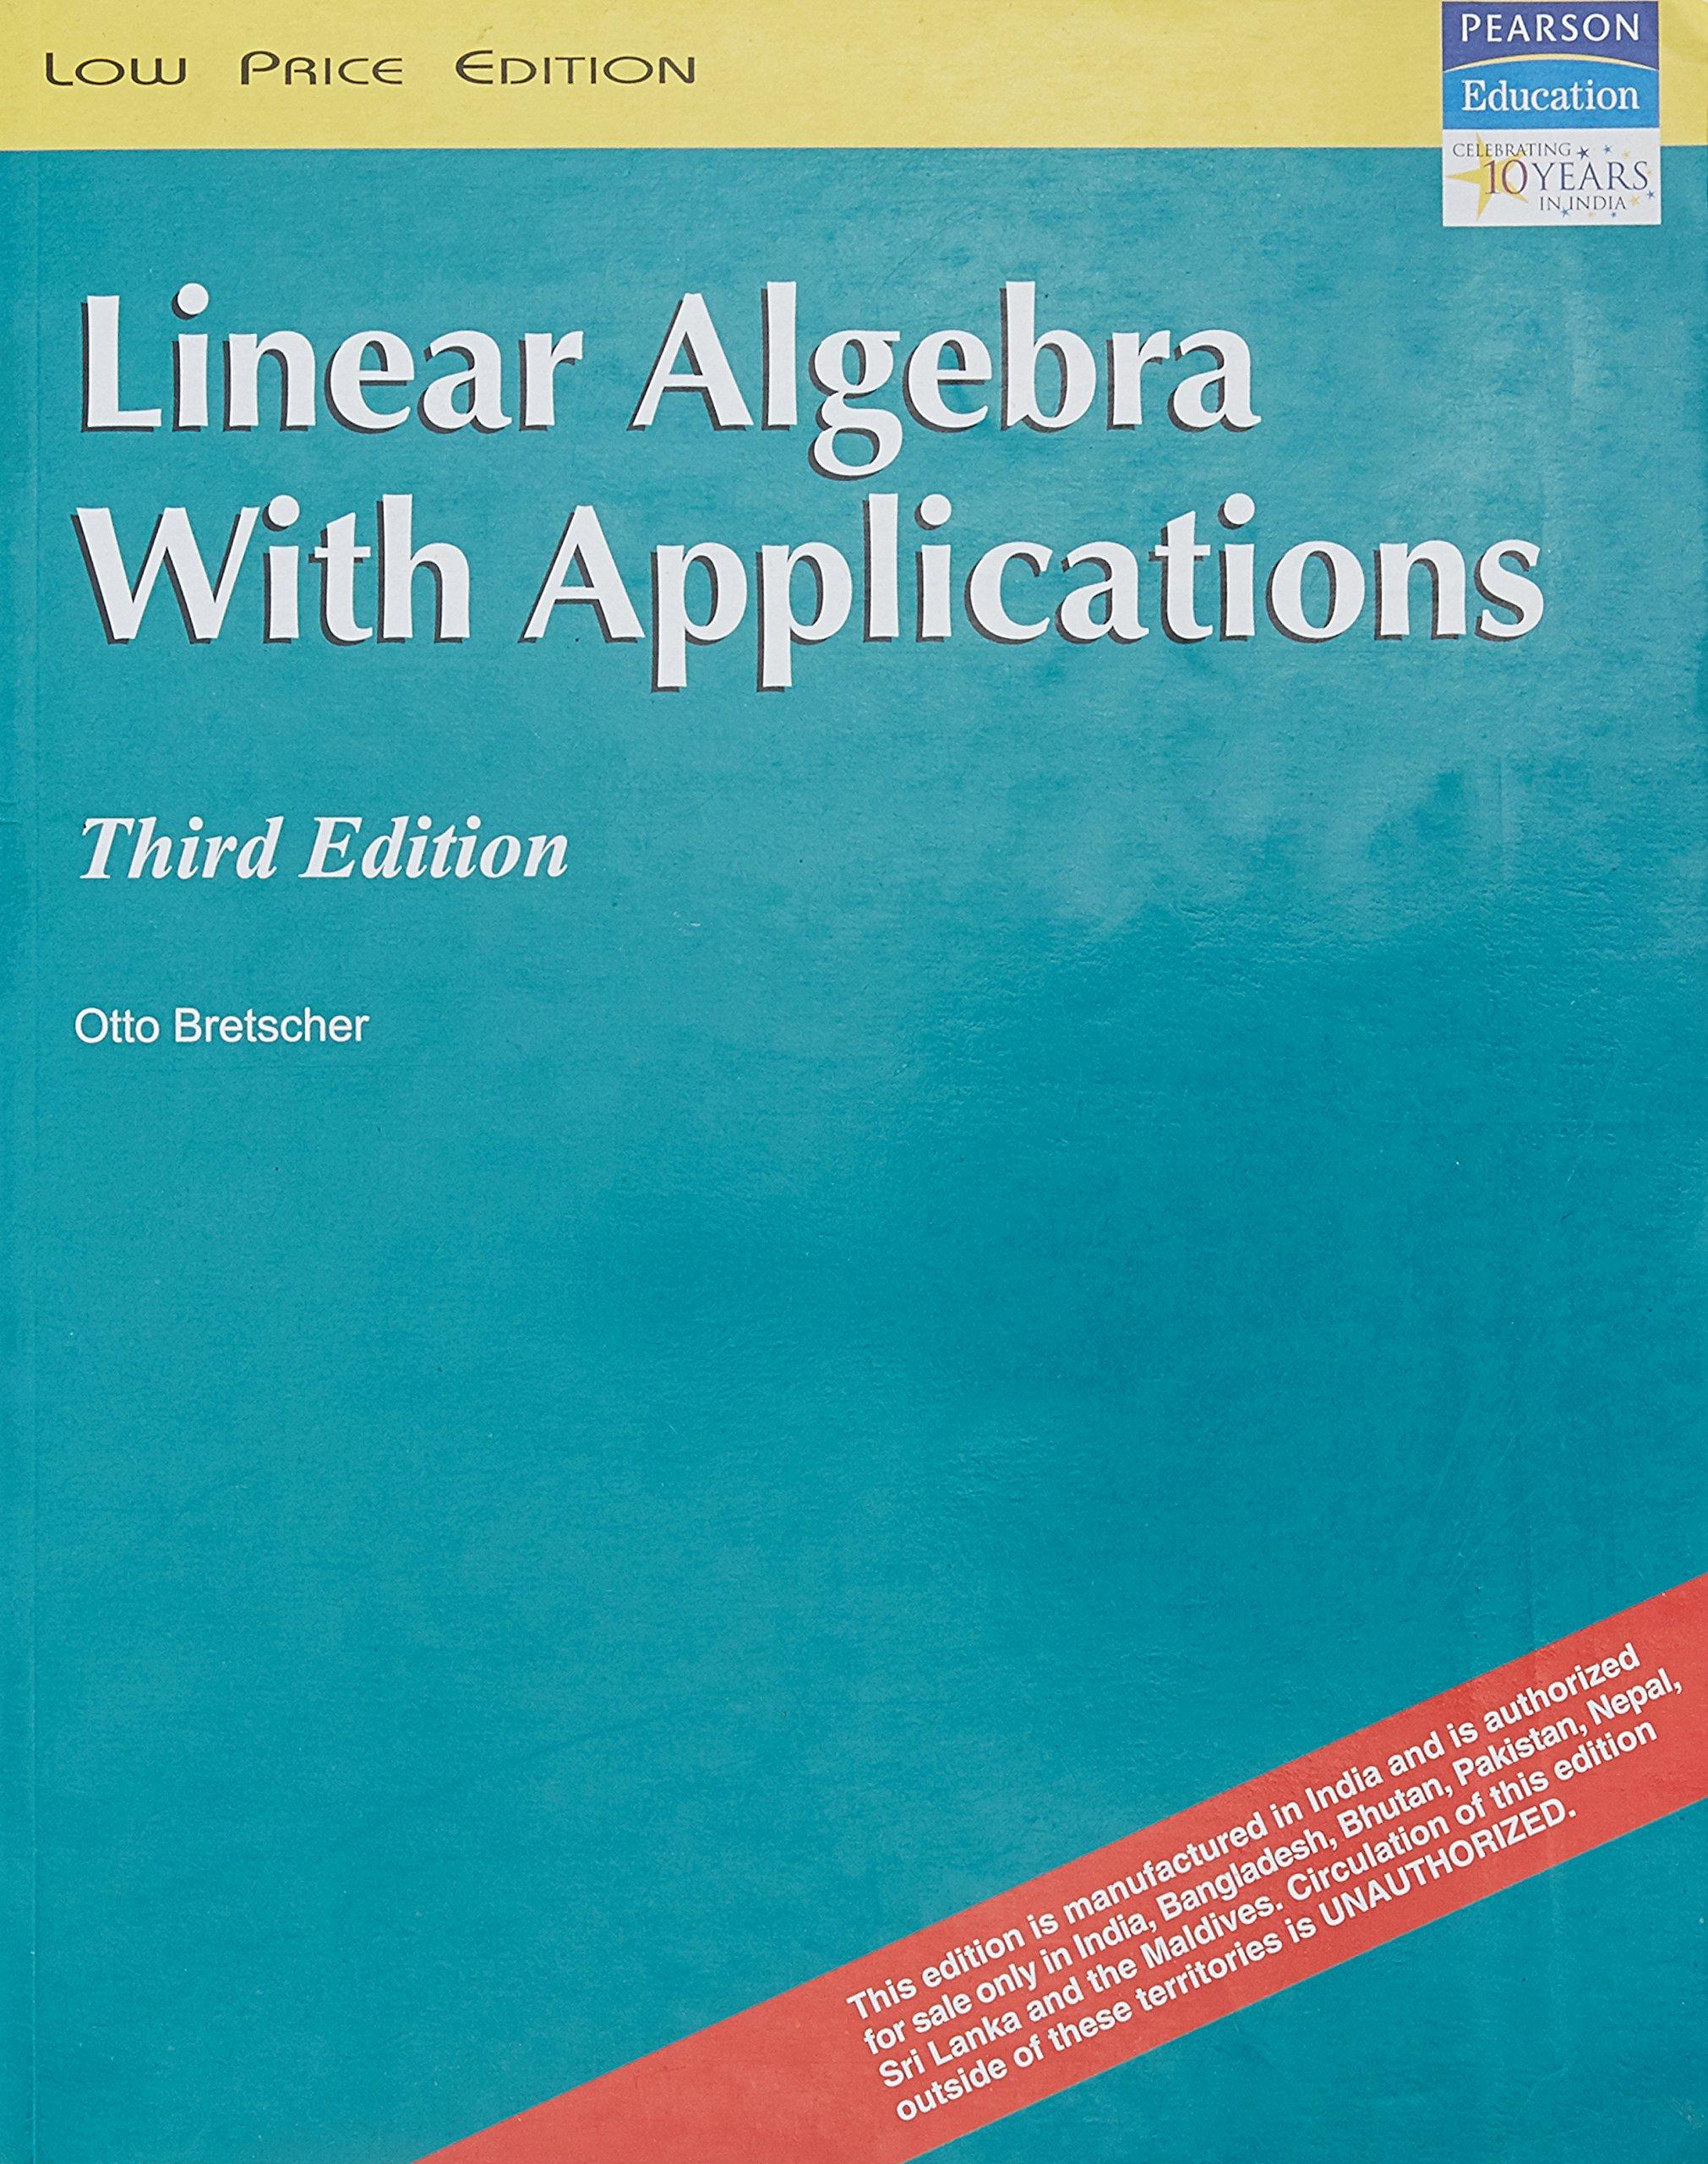 Linear Algebra with Applications: Bretscher: 9788131714416: Amazon ...